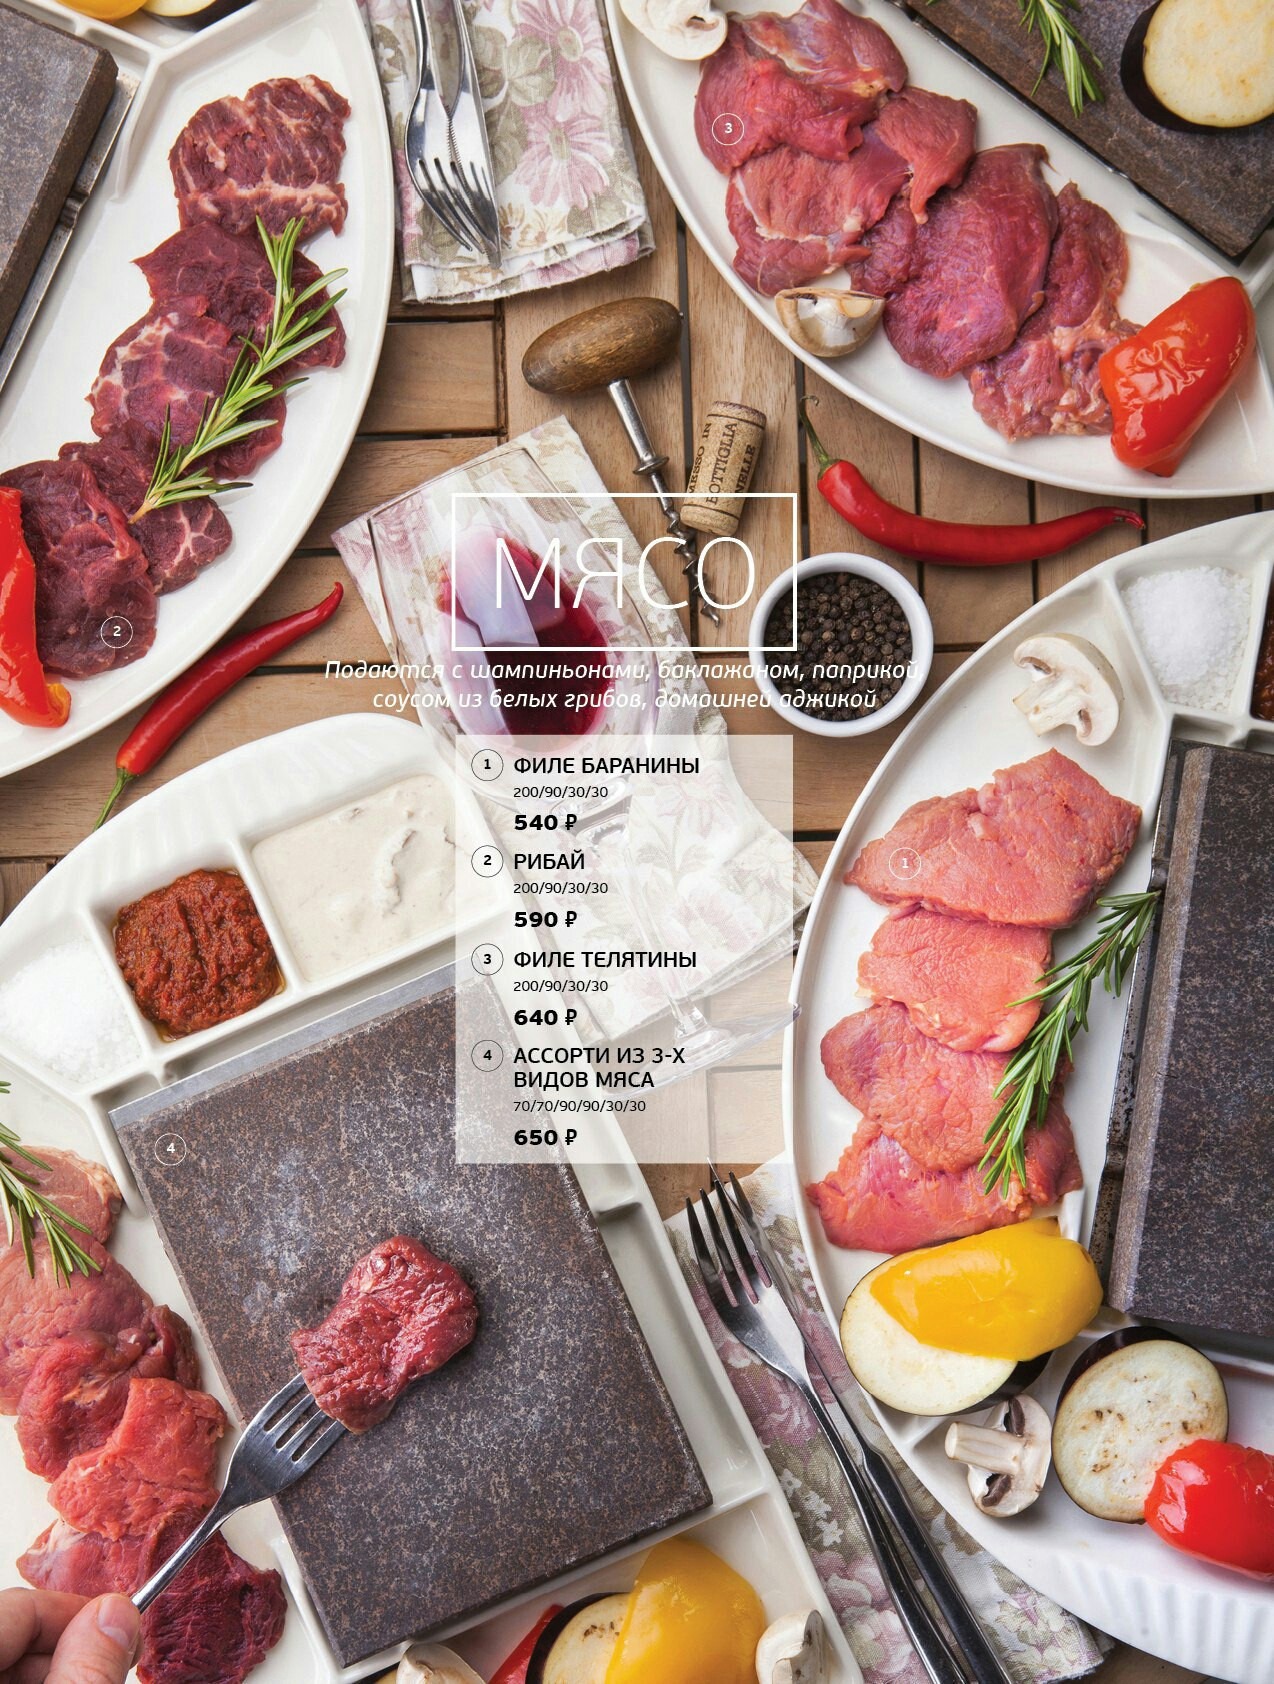 stone grill, gillstone, 400град, стоун гриль, мясо